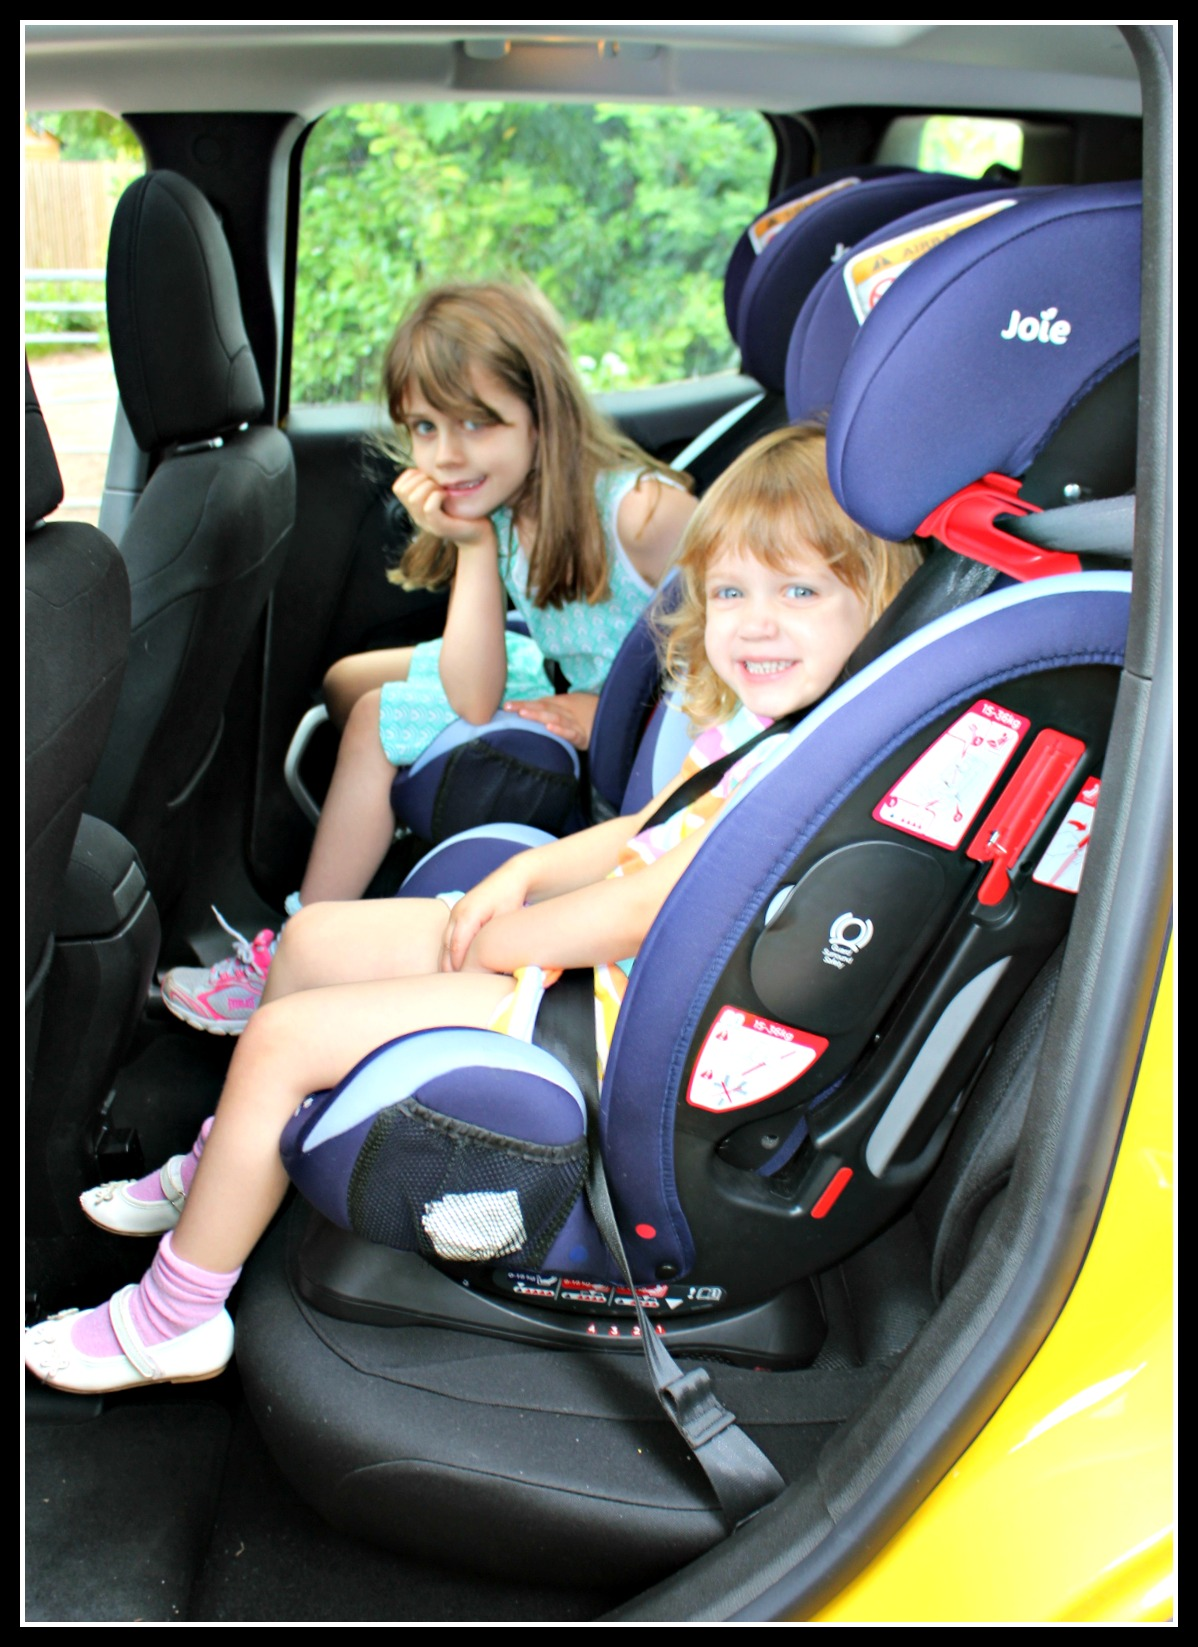 Jeep Renegade; a good family car?